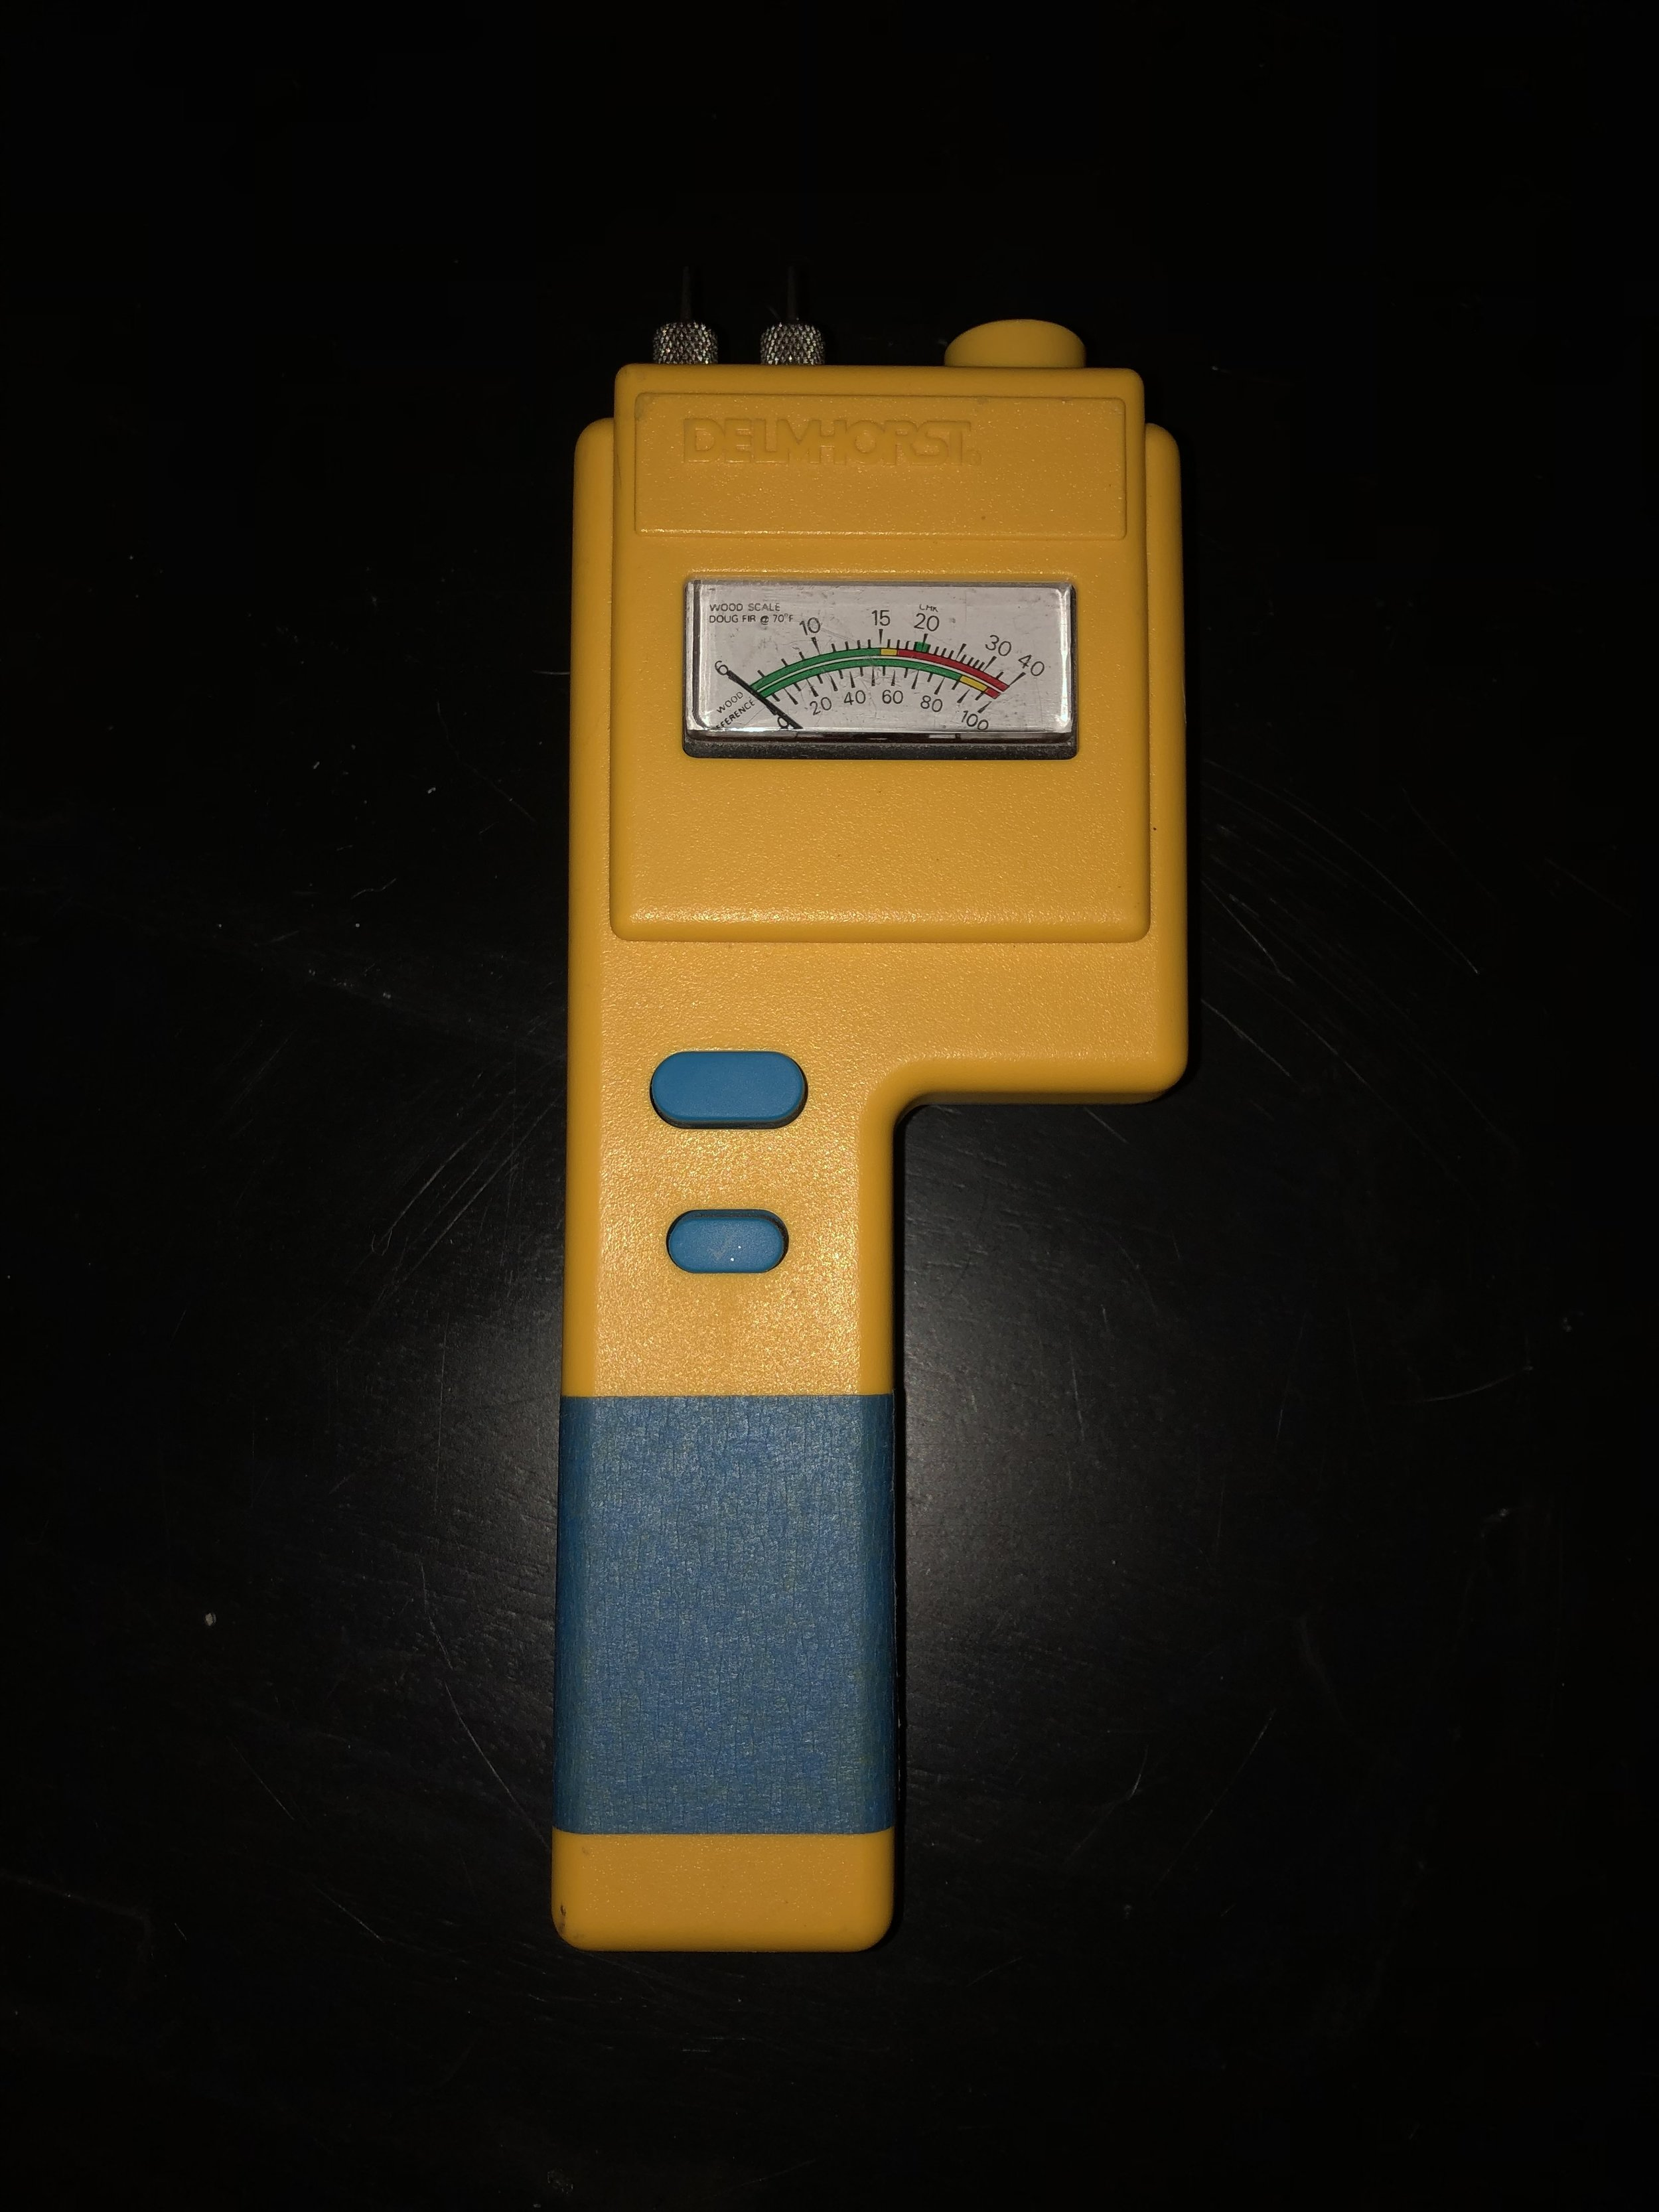 delmhorst-bd-10-moisture-meter.jpg